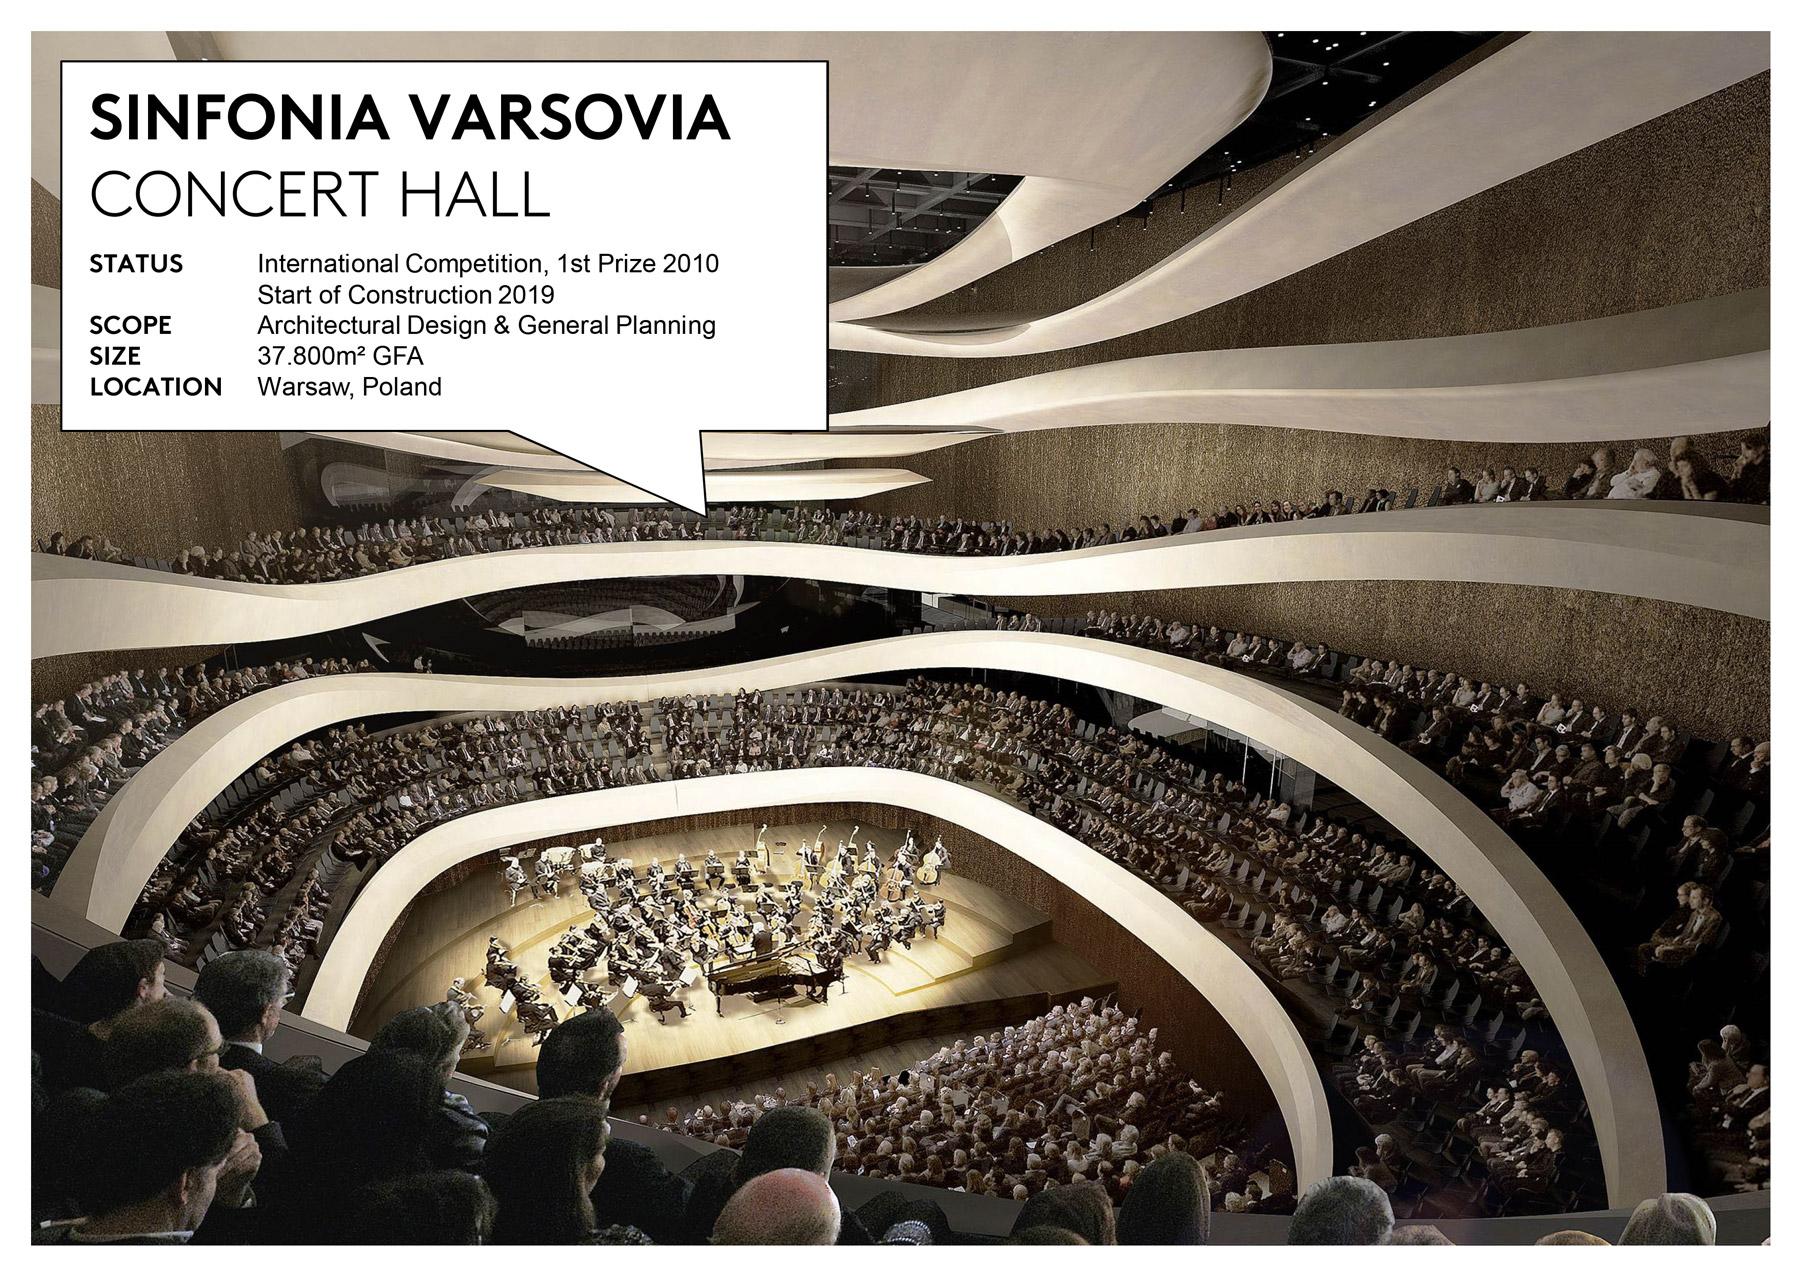 090_SVW_sinfonia_varsovia_Slide_02